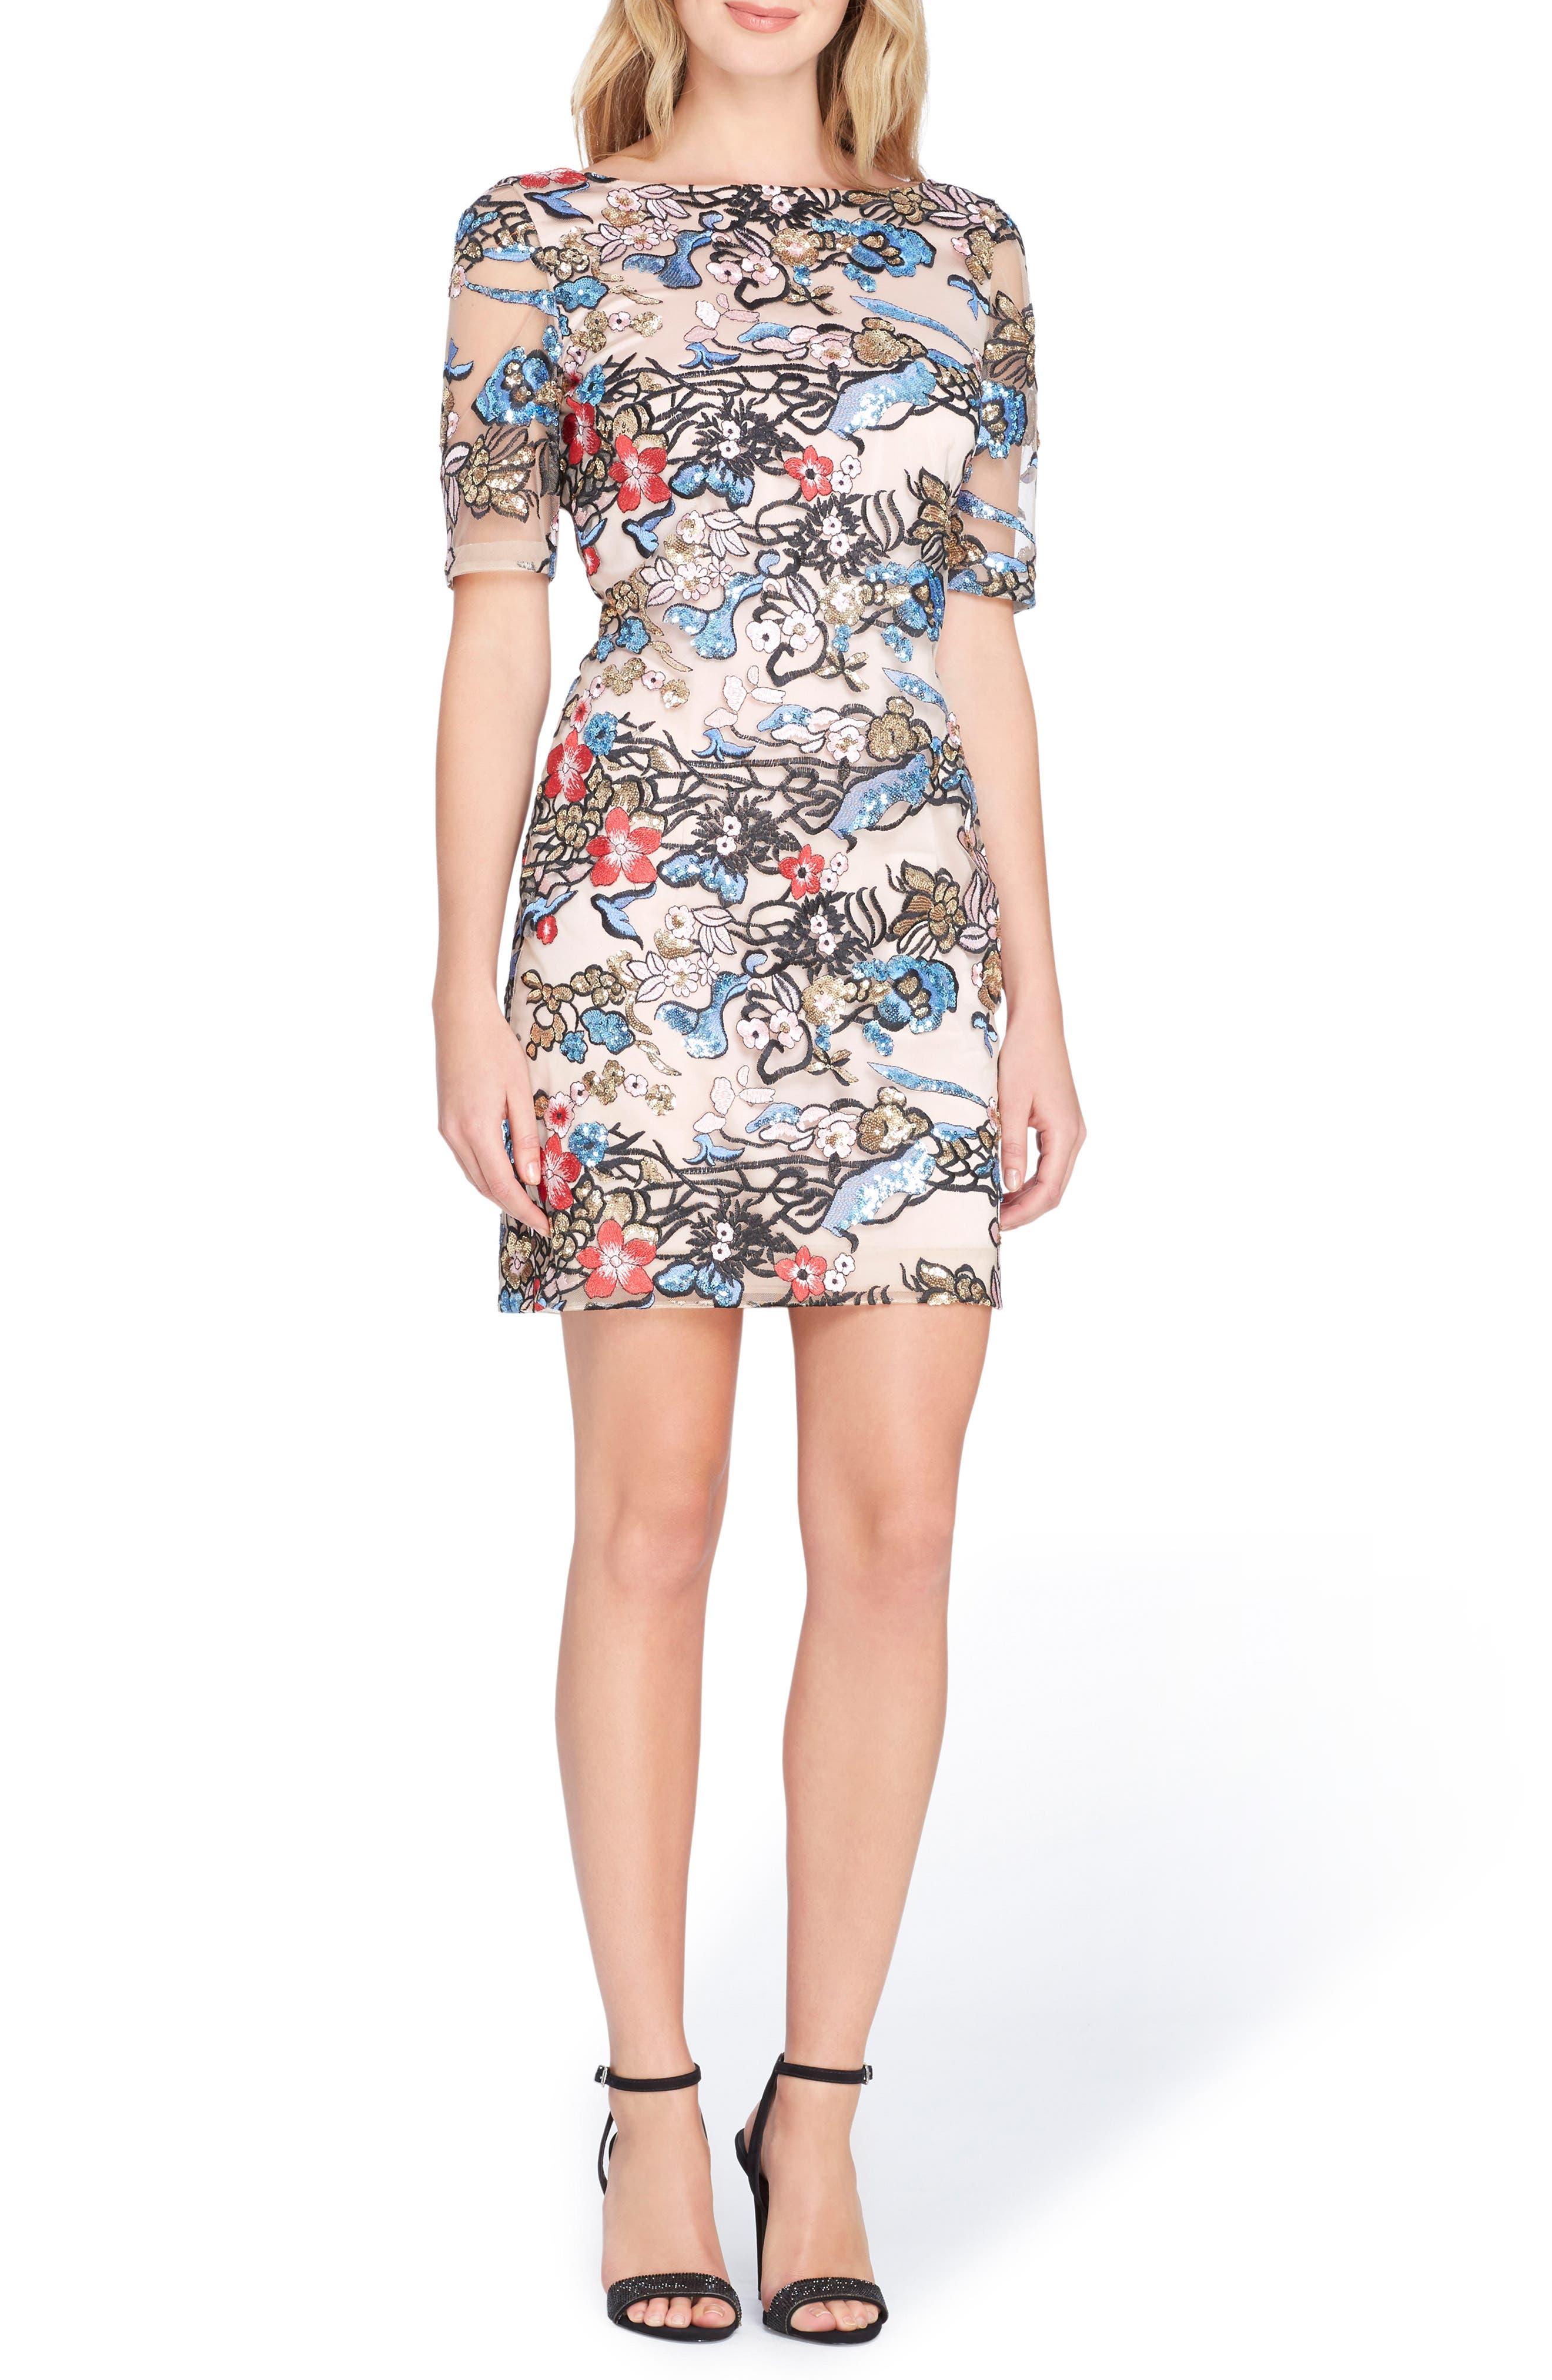 Embroidered Sequin Sheath Dress,                         Main,                         color, Blush/ Peri/ Black